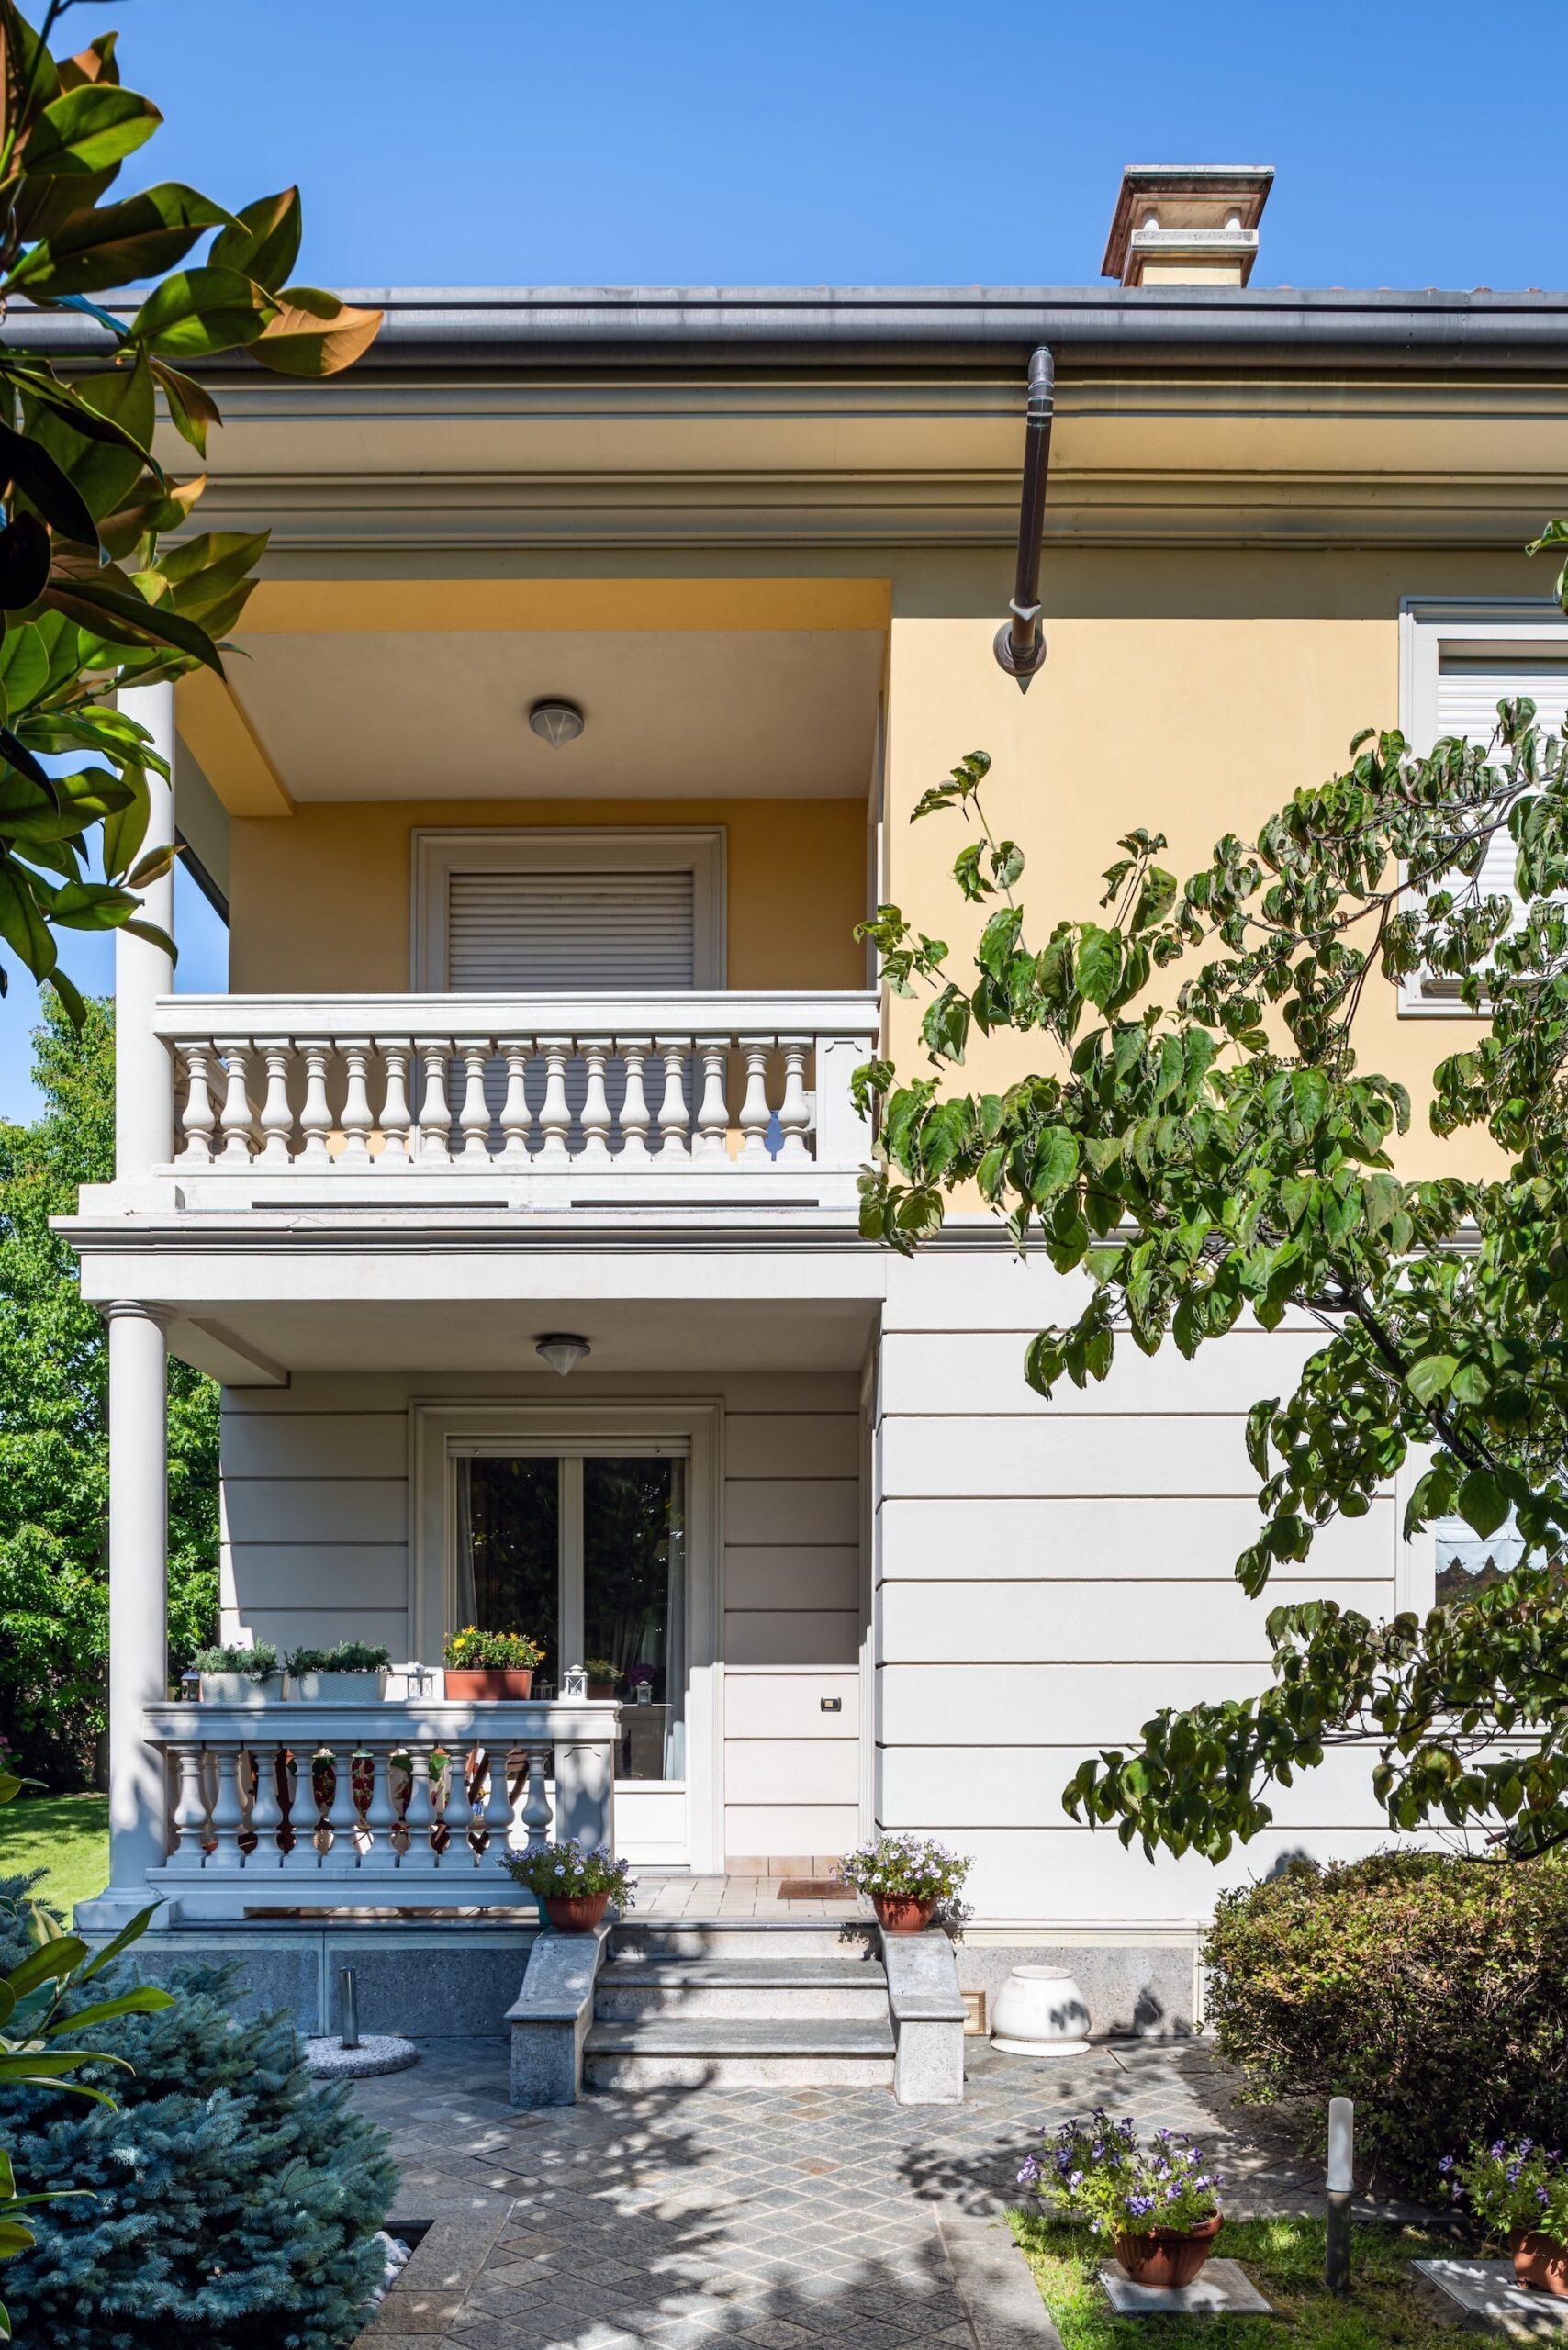 Villa Bifamilaire, Via D. L. Monza 31 Saronno-HDR-1